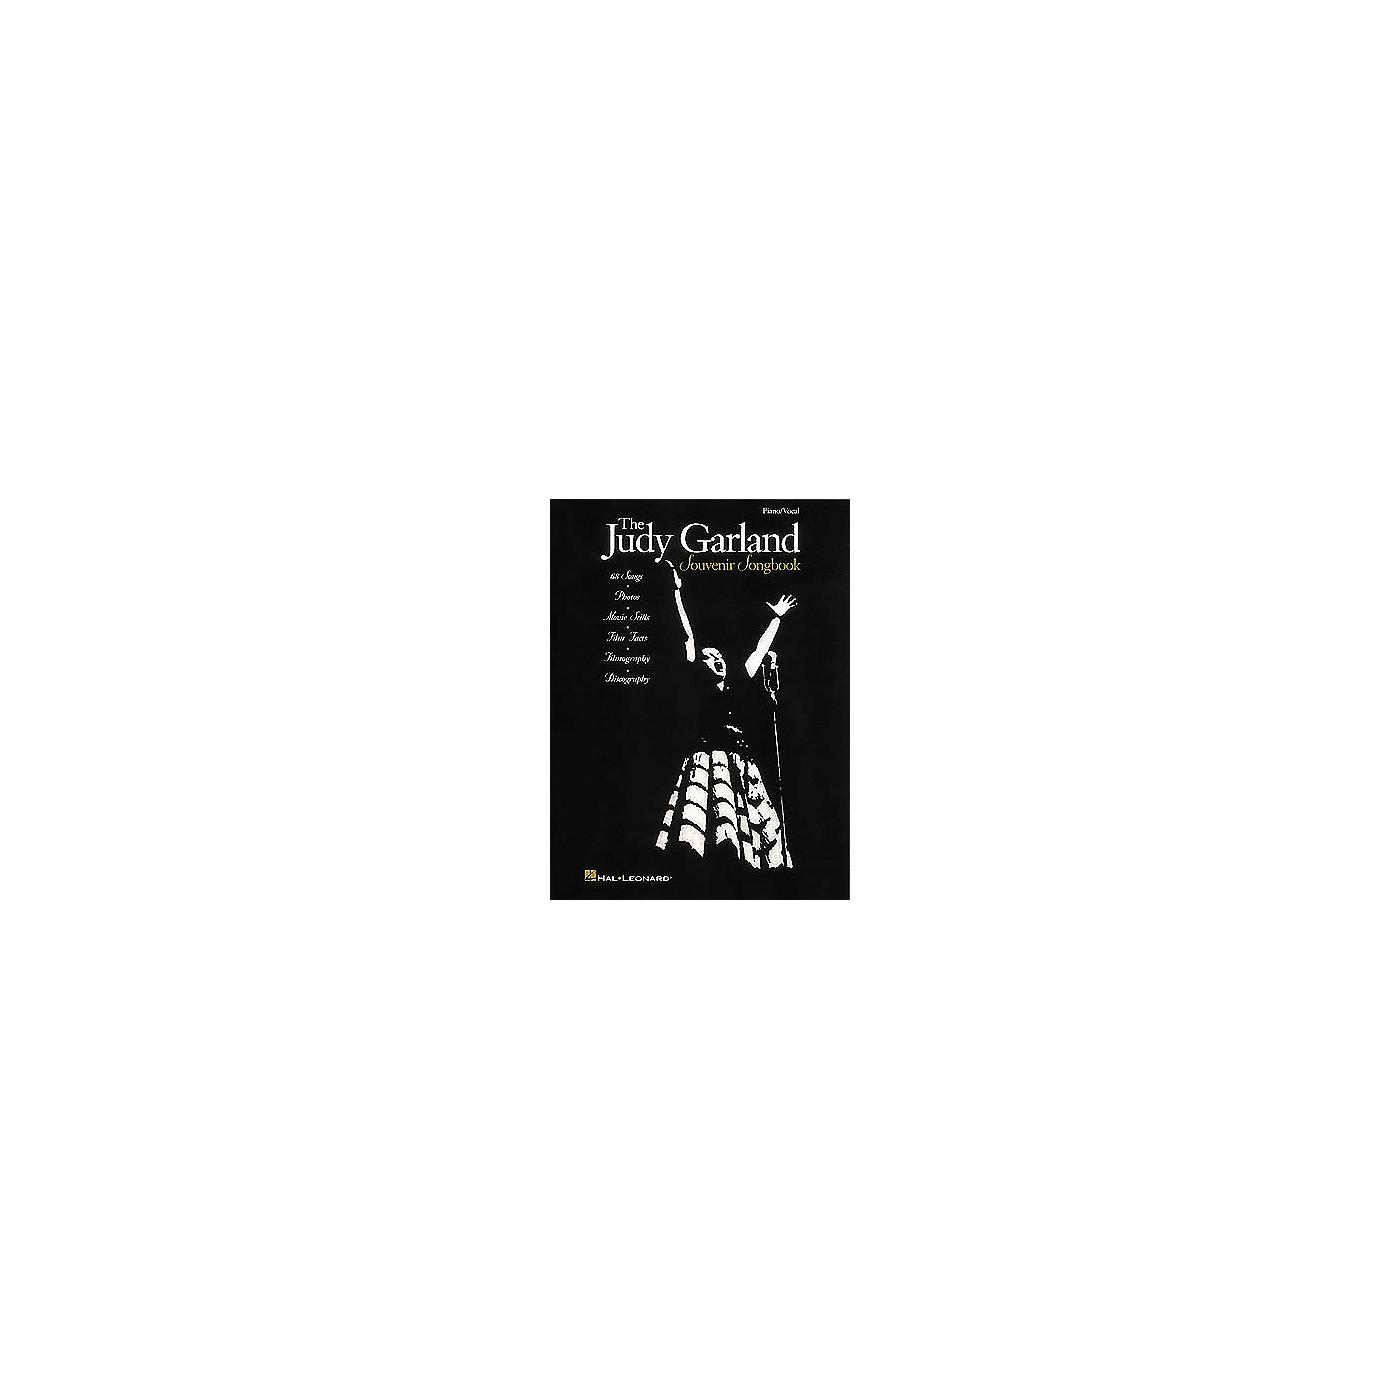 Hal Leonard The Judy Garland Souvenir Piano, Vocal, Guitar Songbook thumbnail